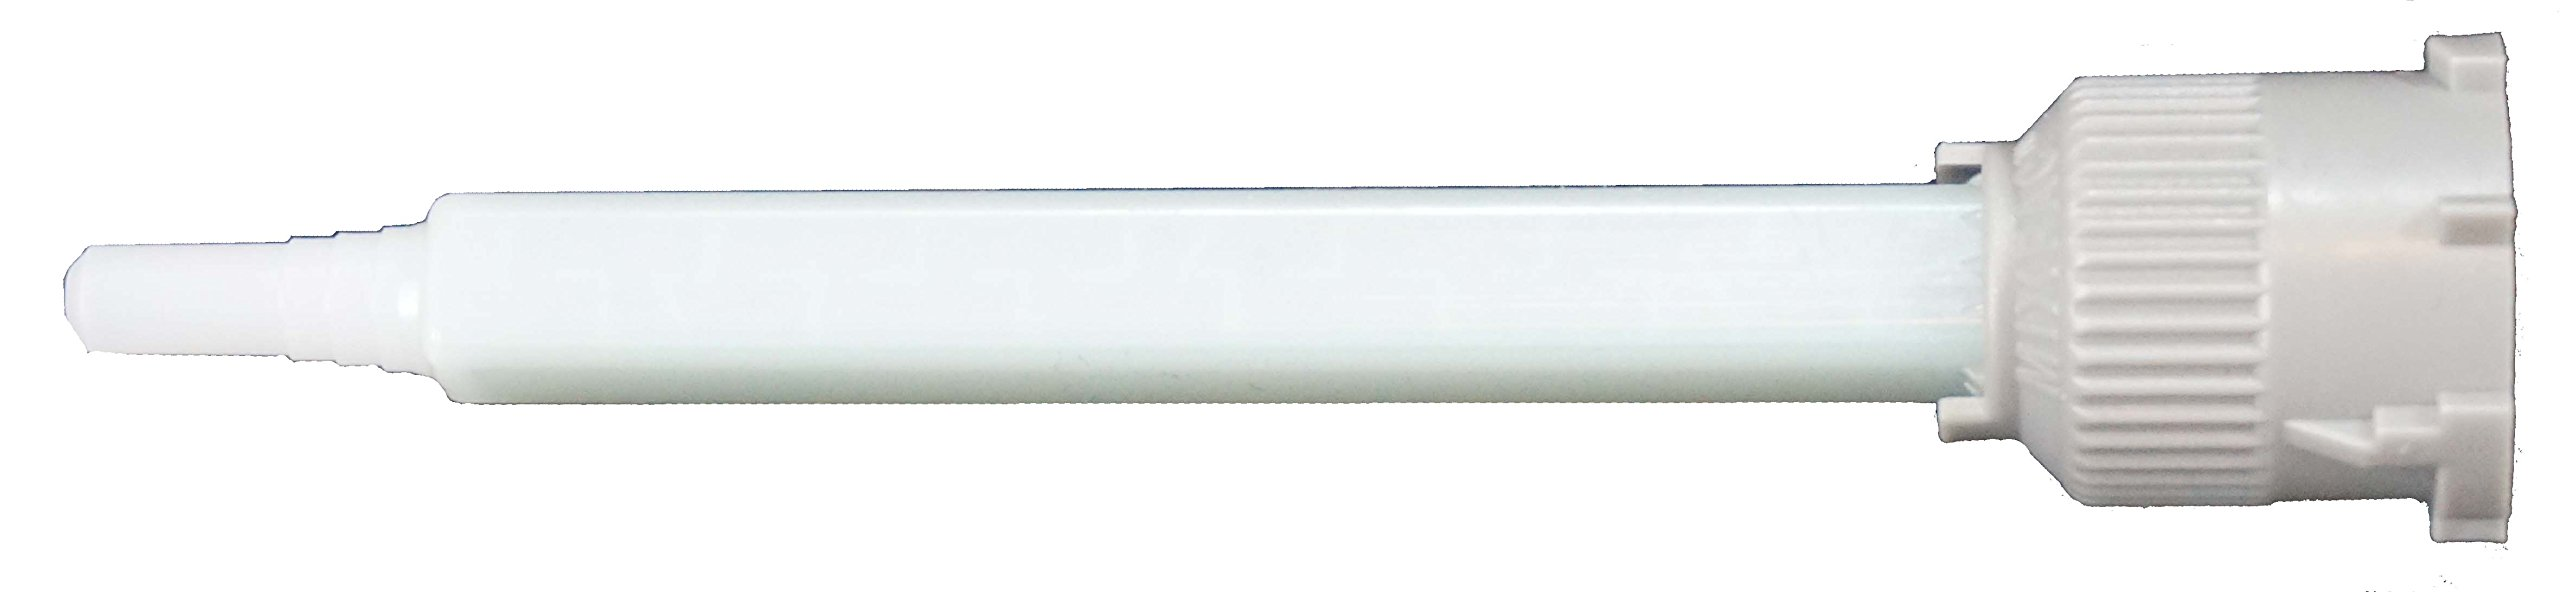 100x Epoxy Mixing Nozzle 1:1 Static Mixing Length 103mm Dual Epoxy Cartridge